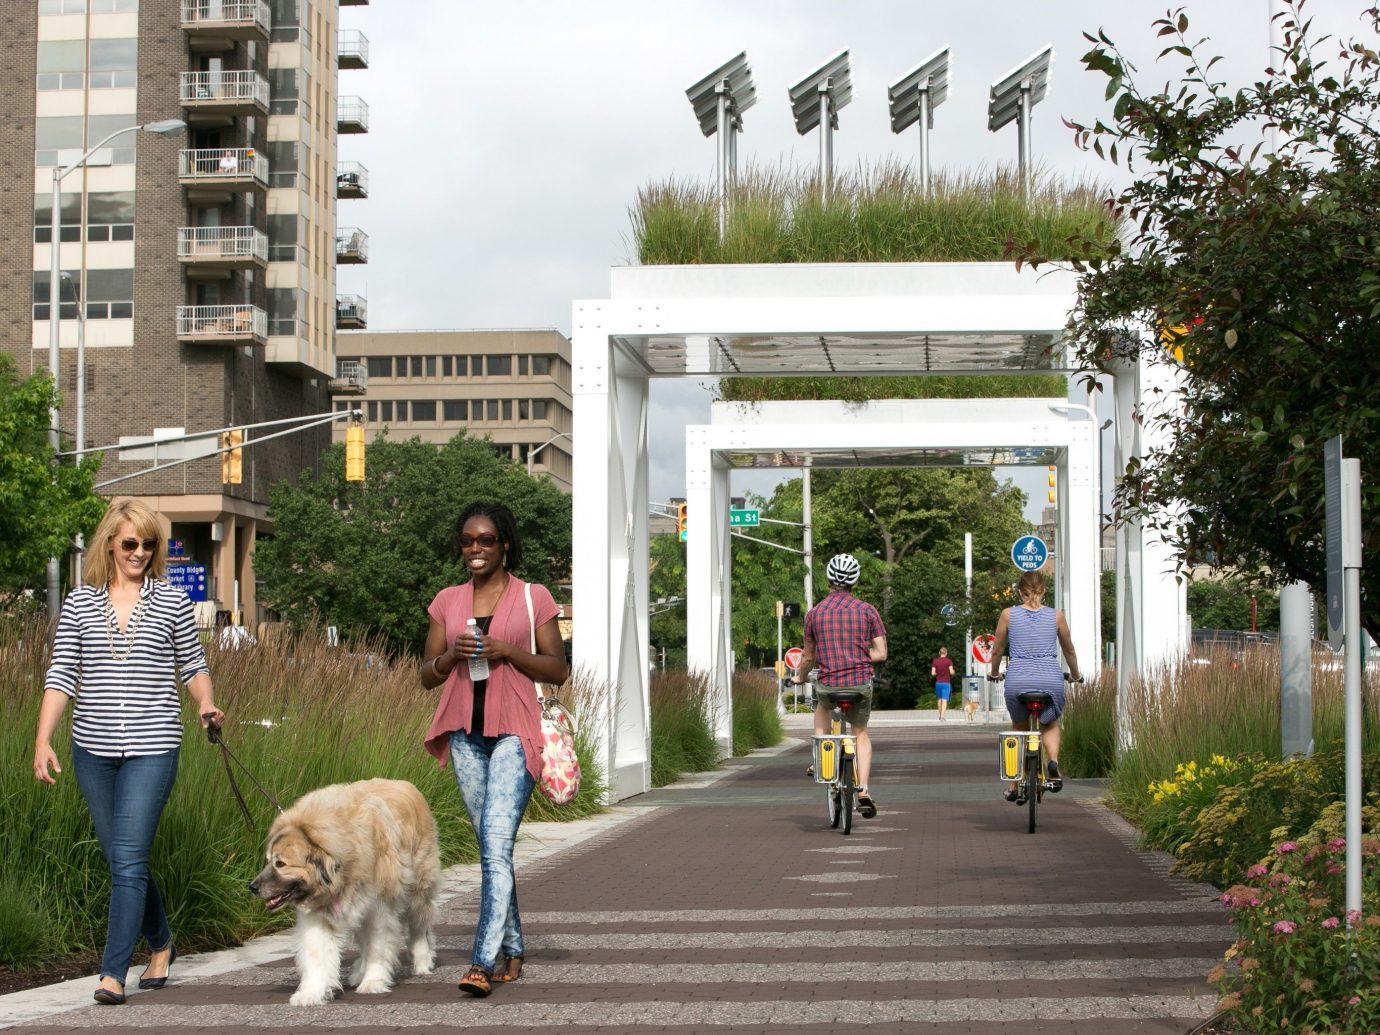 Health + Wellness Trip Ideas outdoor tree road neighbourhood pedestrian walkway